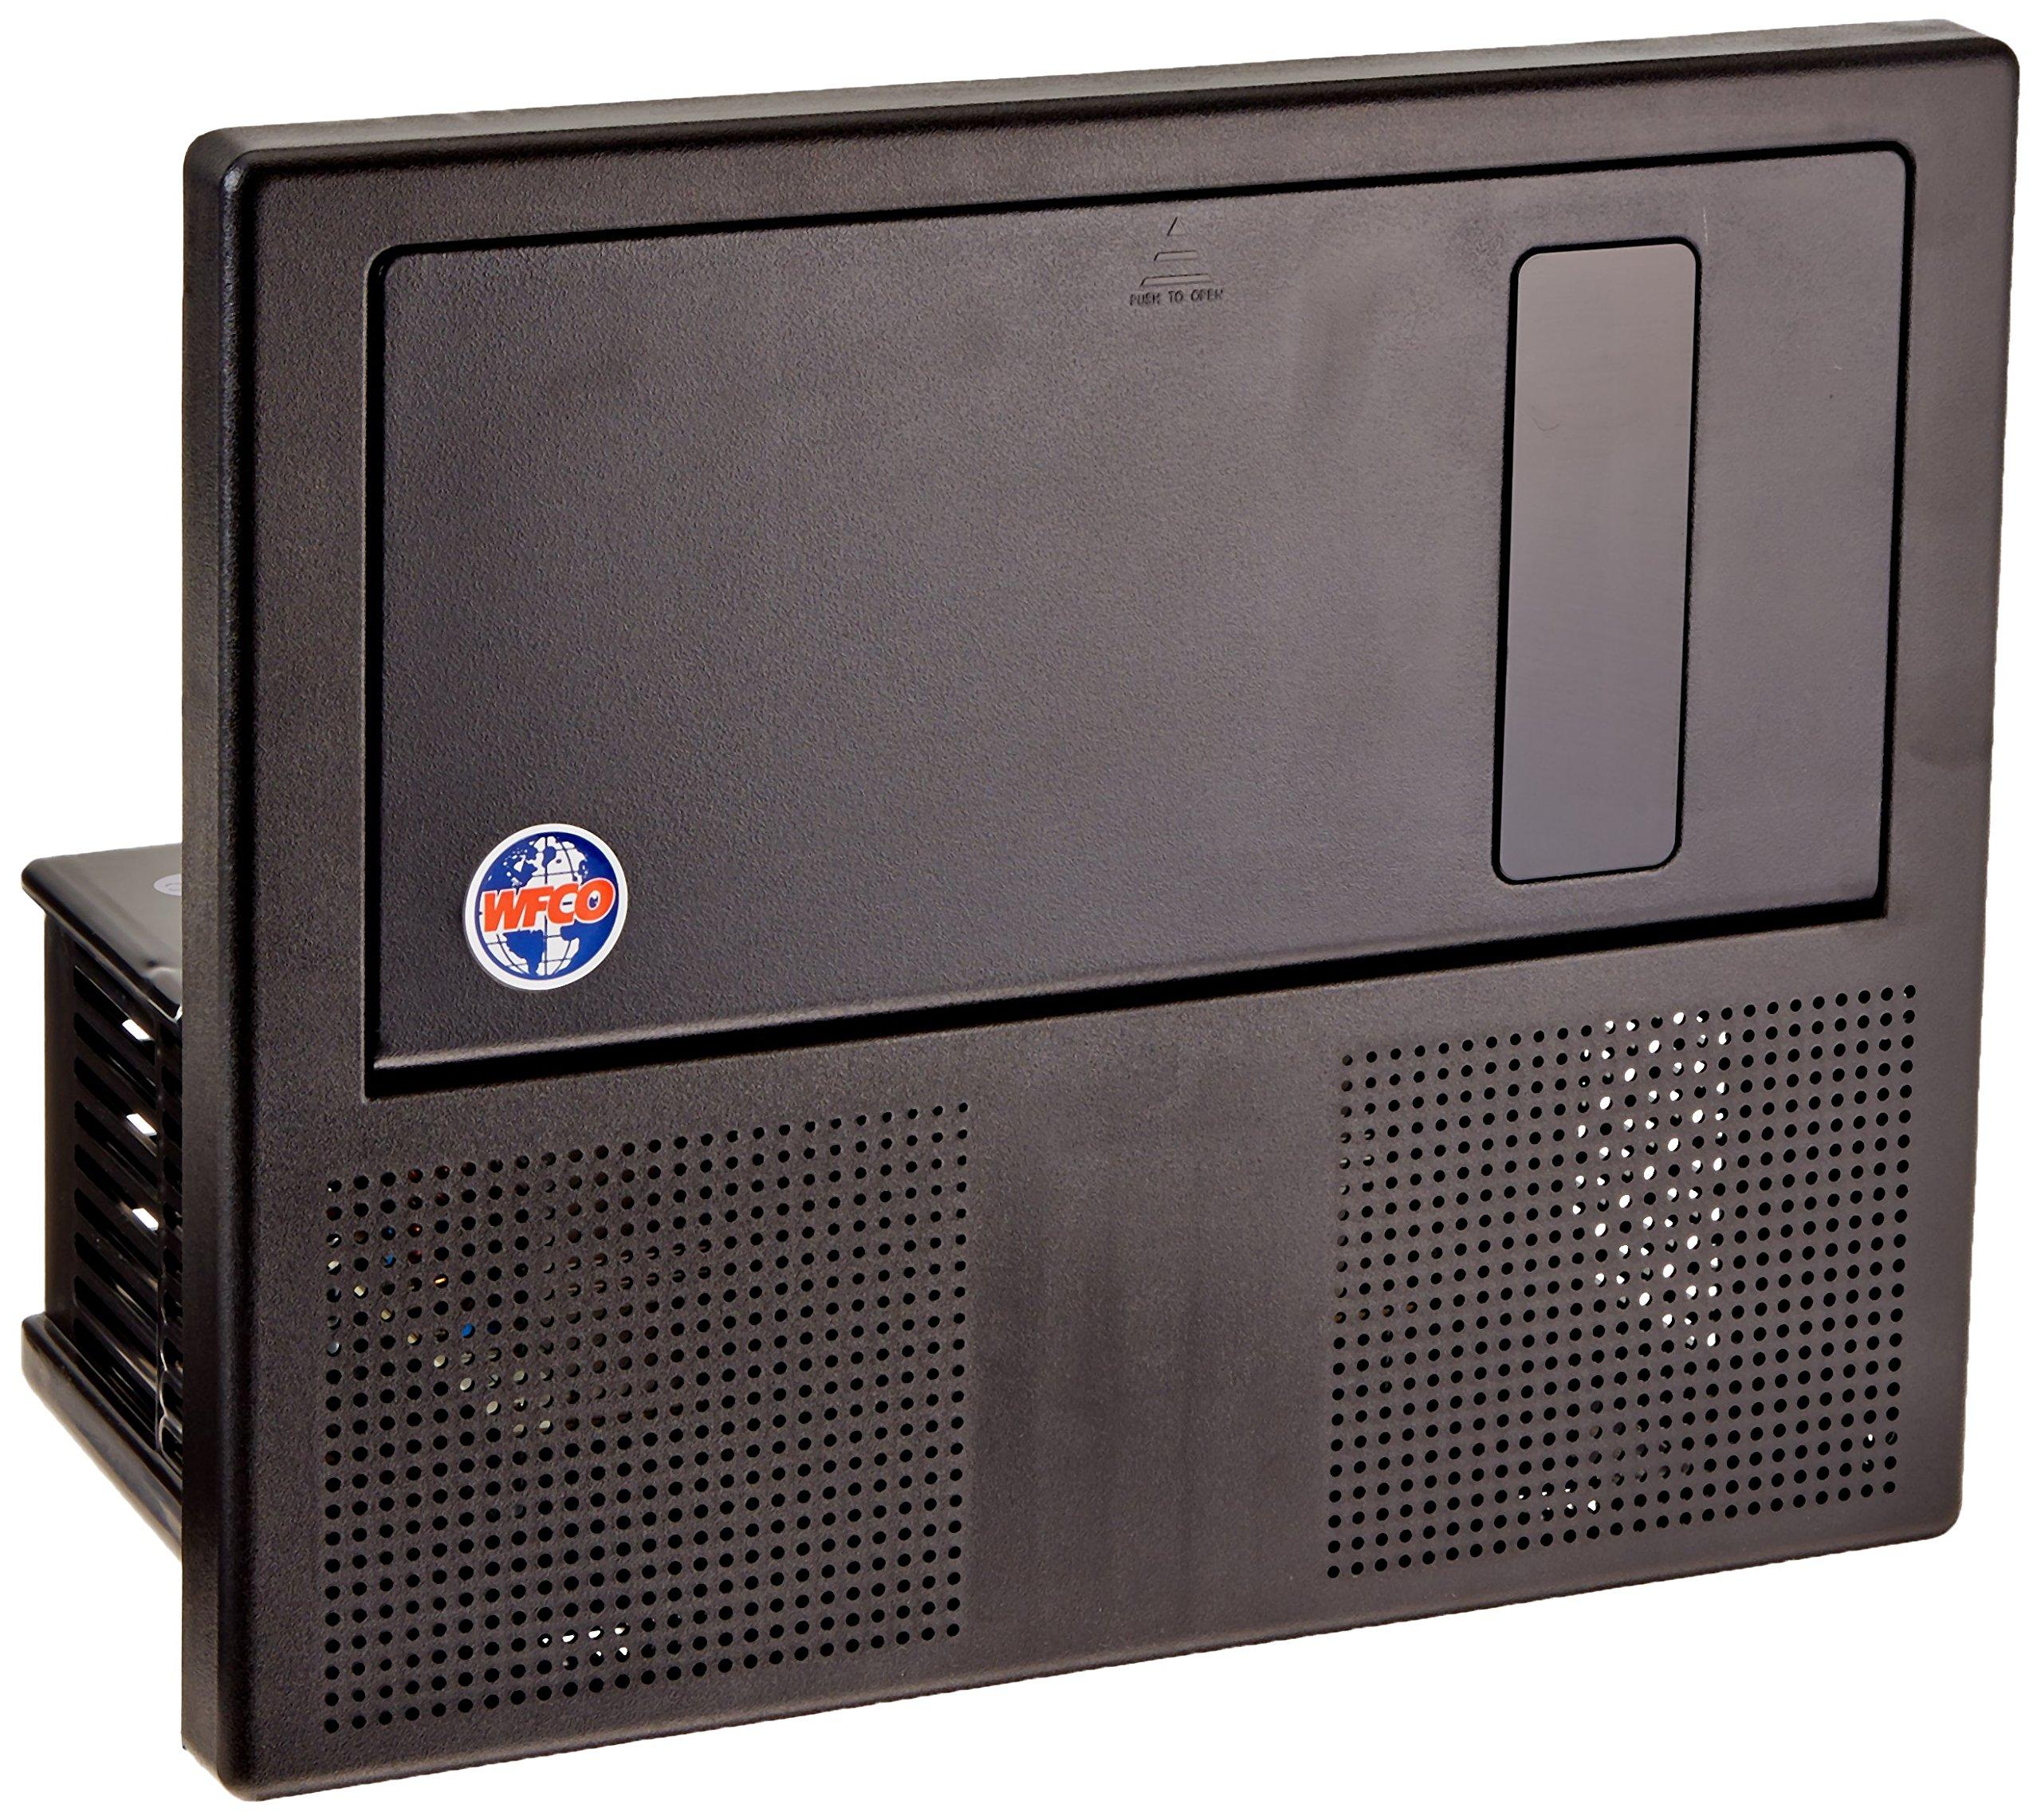 Amazon.com: WFCO WF8955PECB Black 55 Amps Power Center Converter Charger:  Automotive